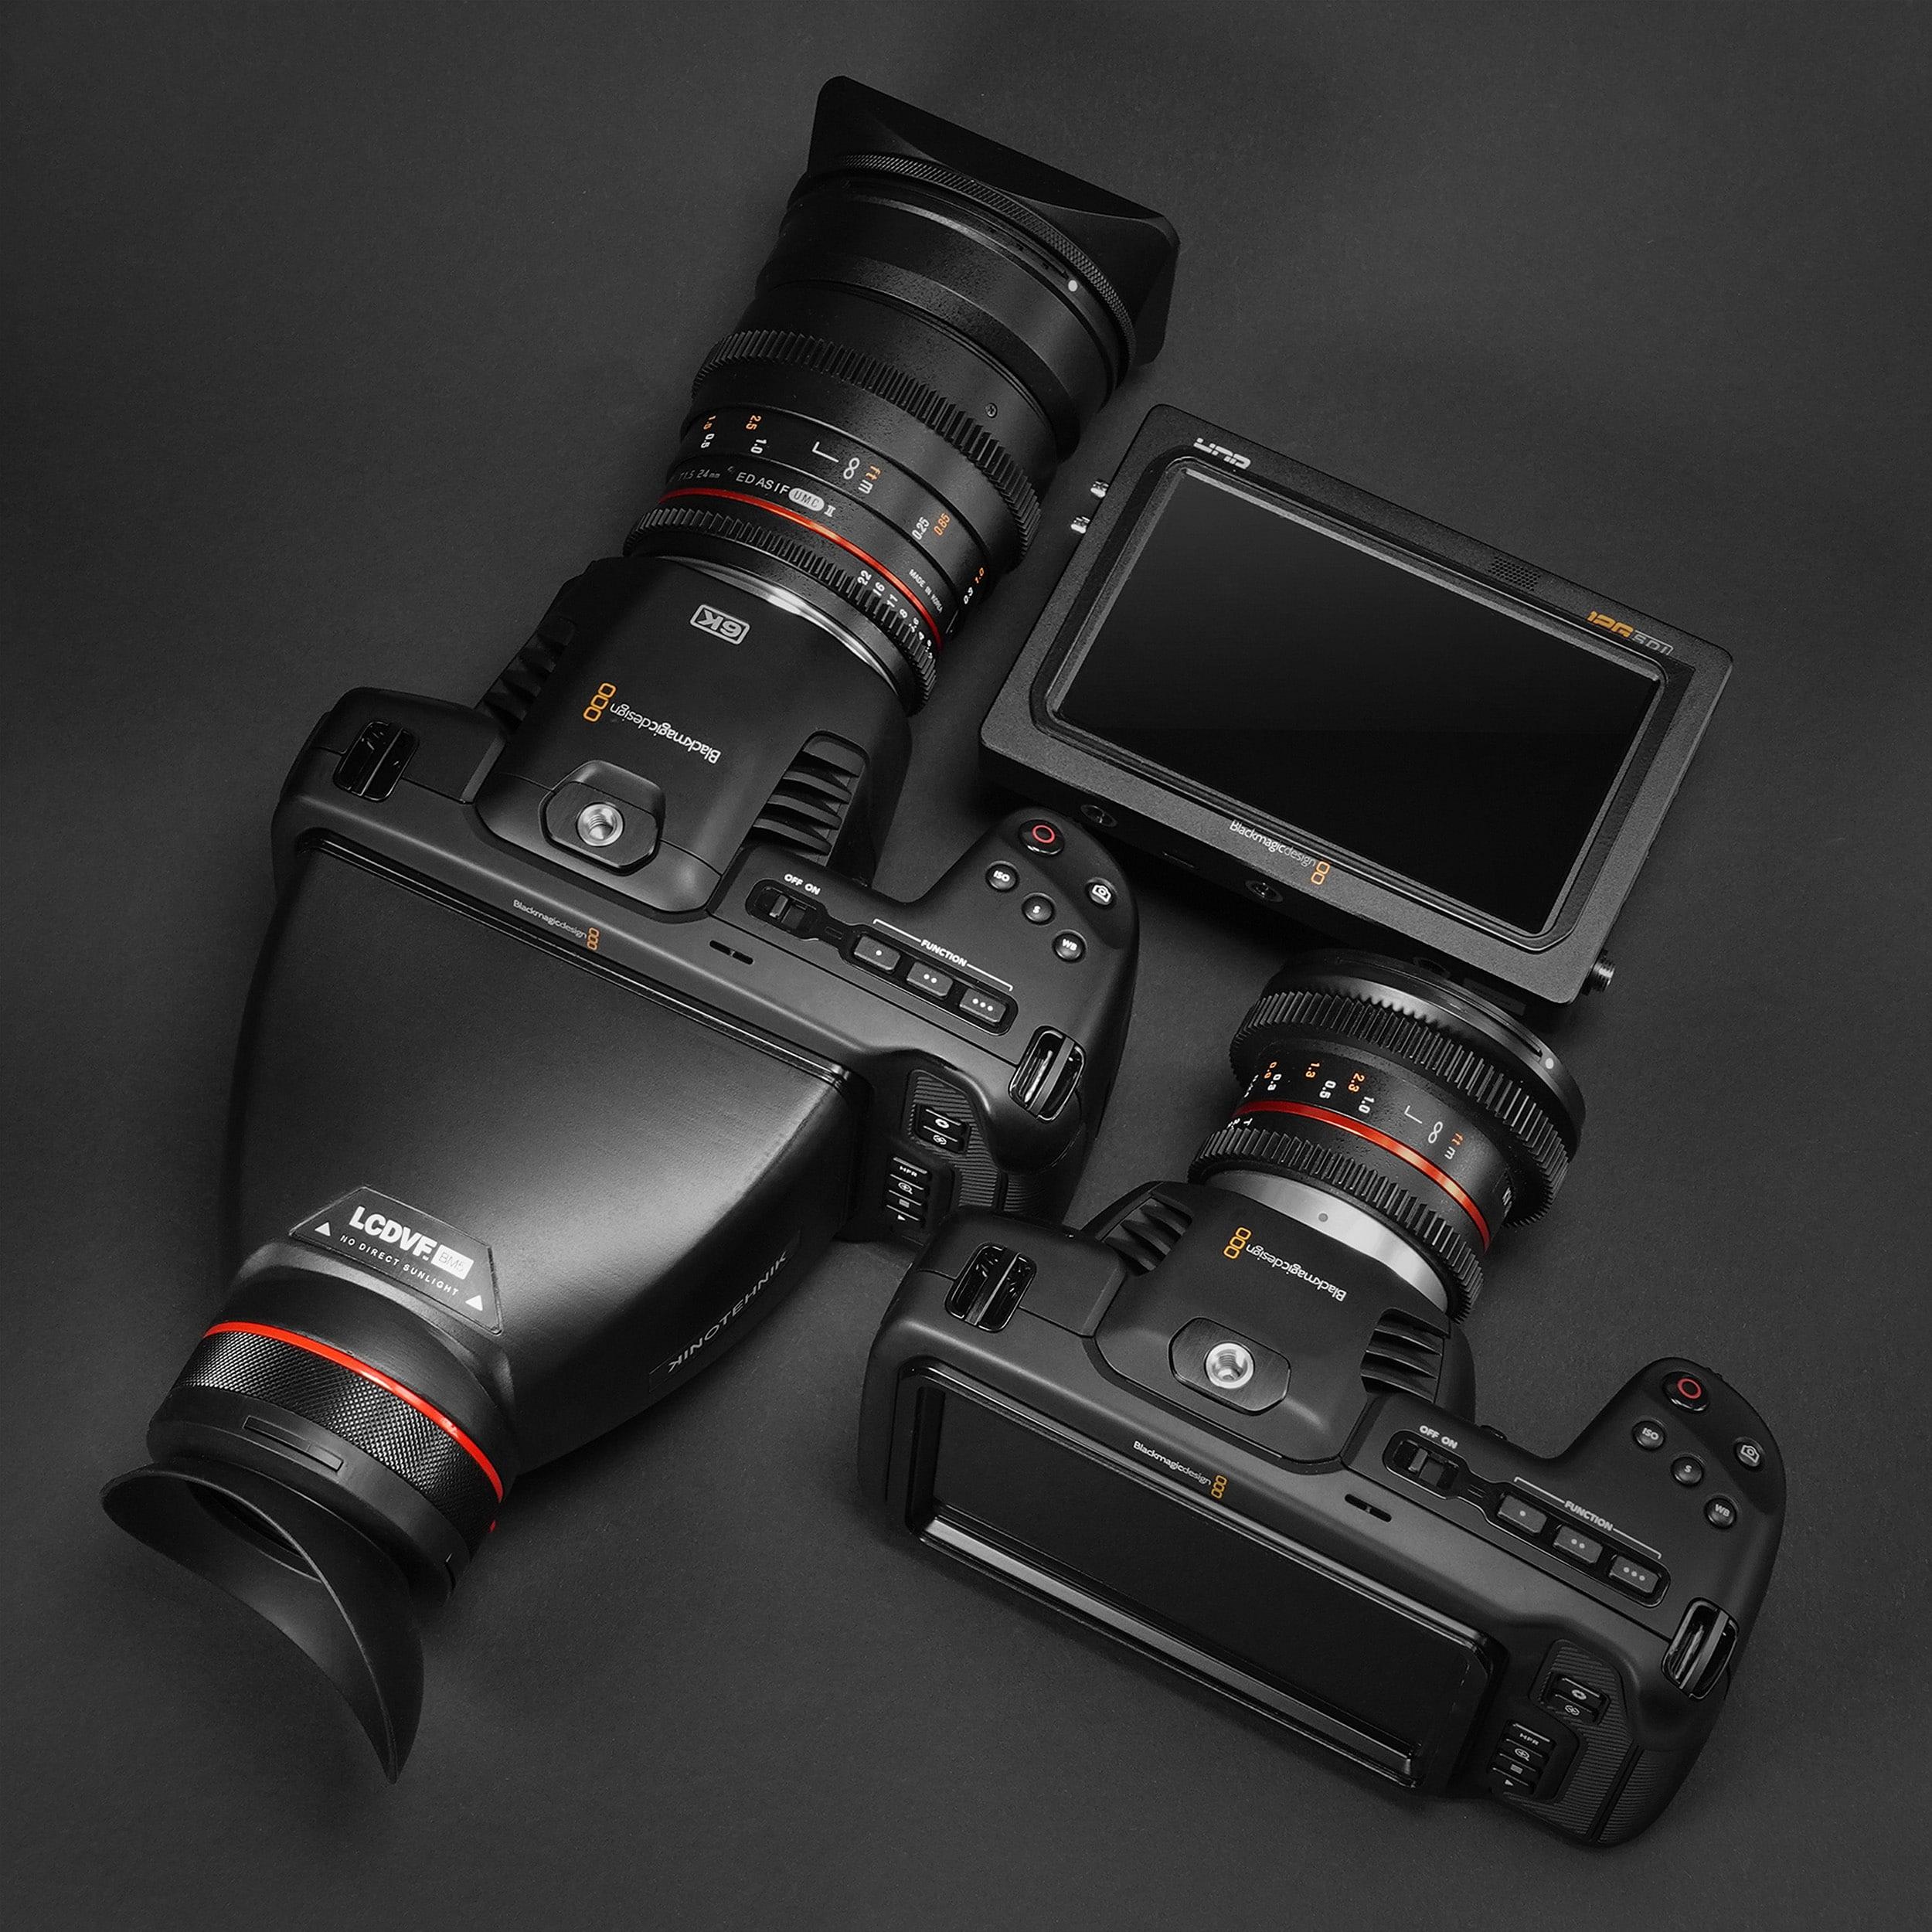 Lcdvf Bm5 Optical Viewfinder Kinotehnik Com